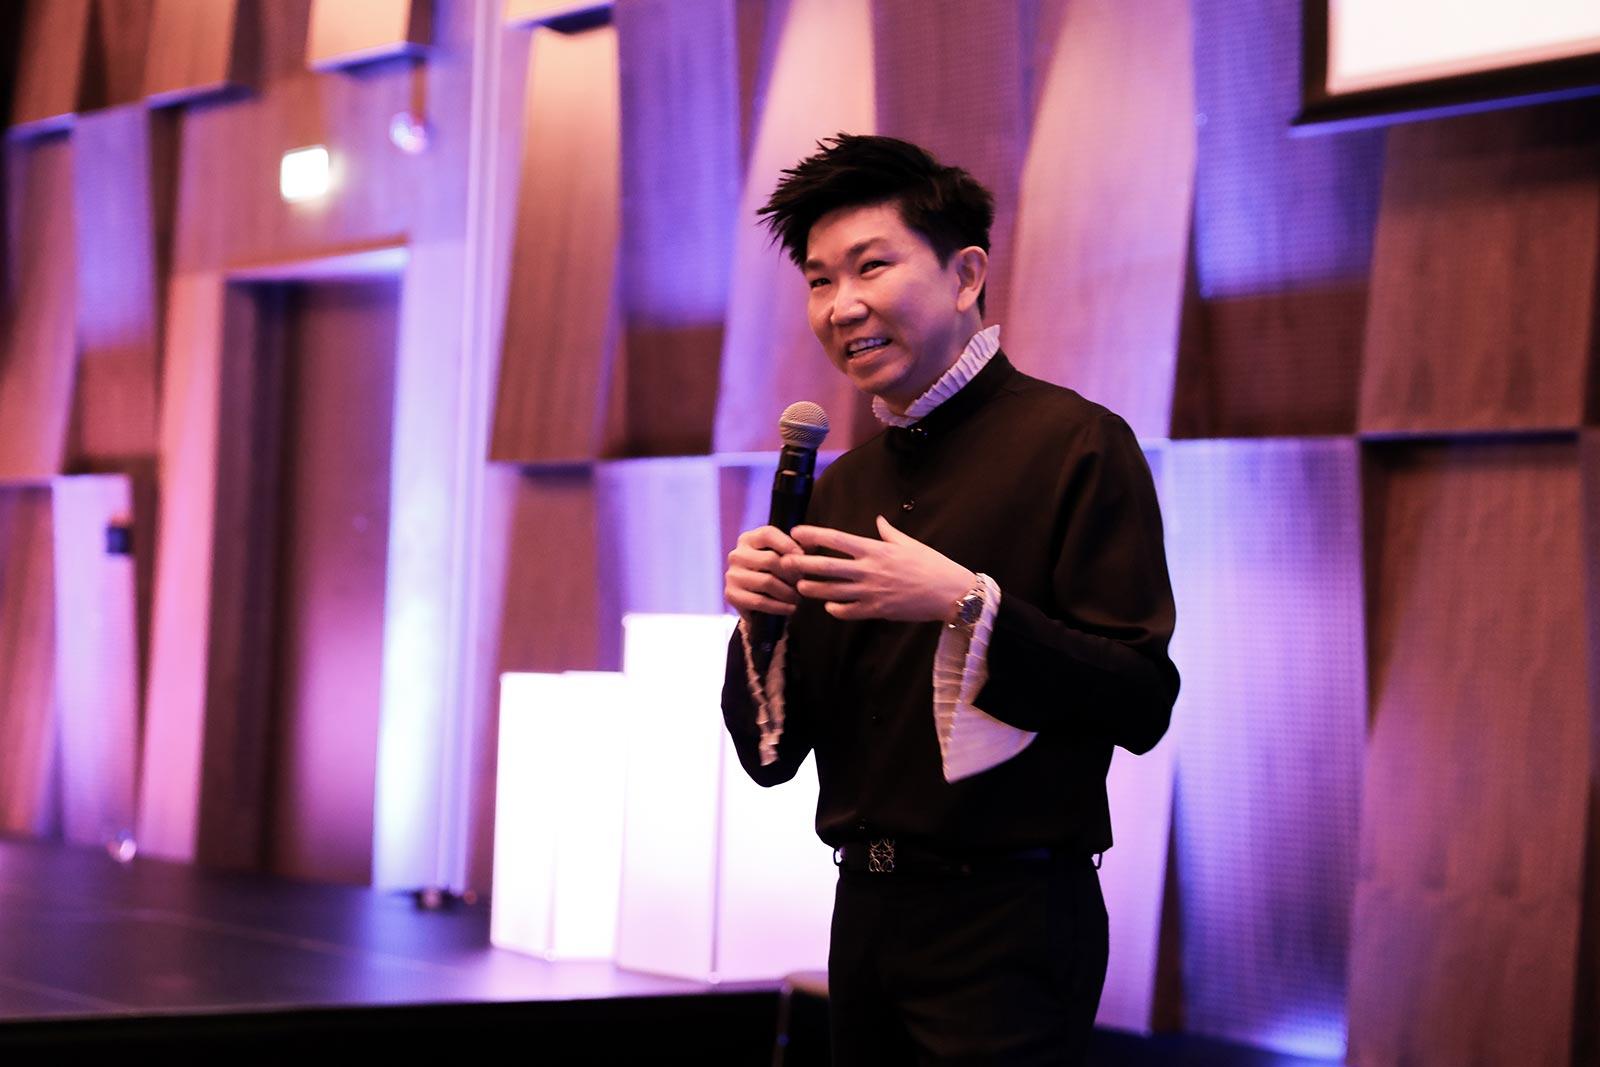 Senzie Conference 2019 - Dr. Kieren Bong